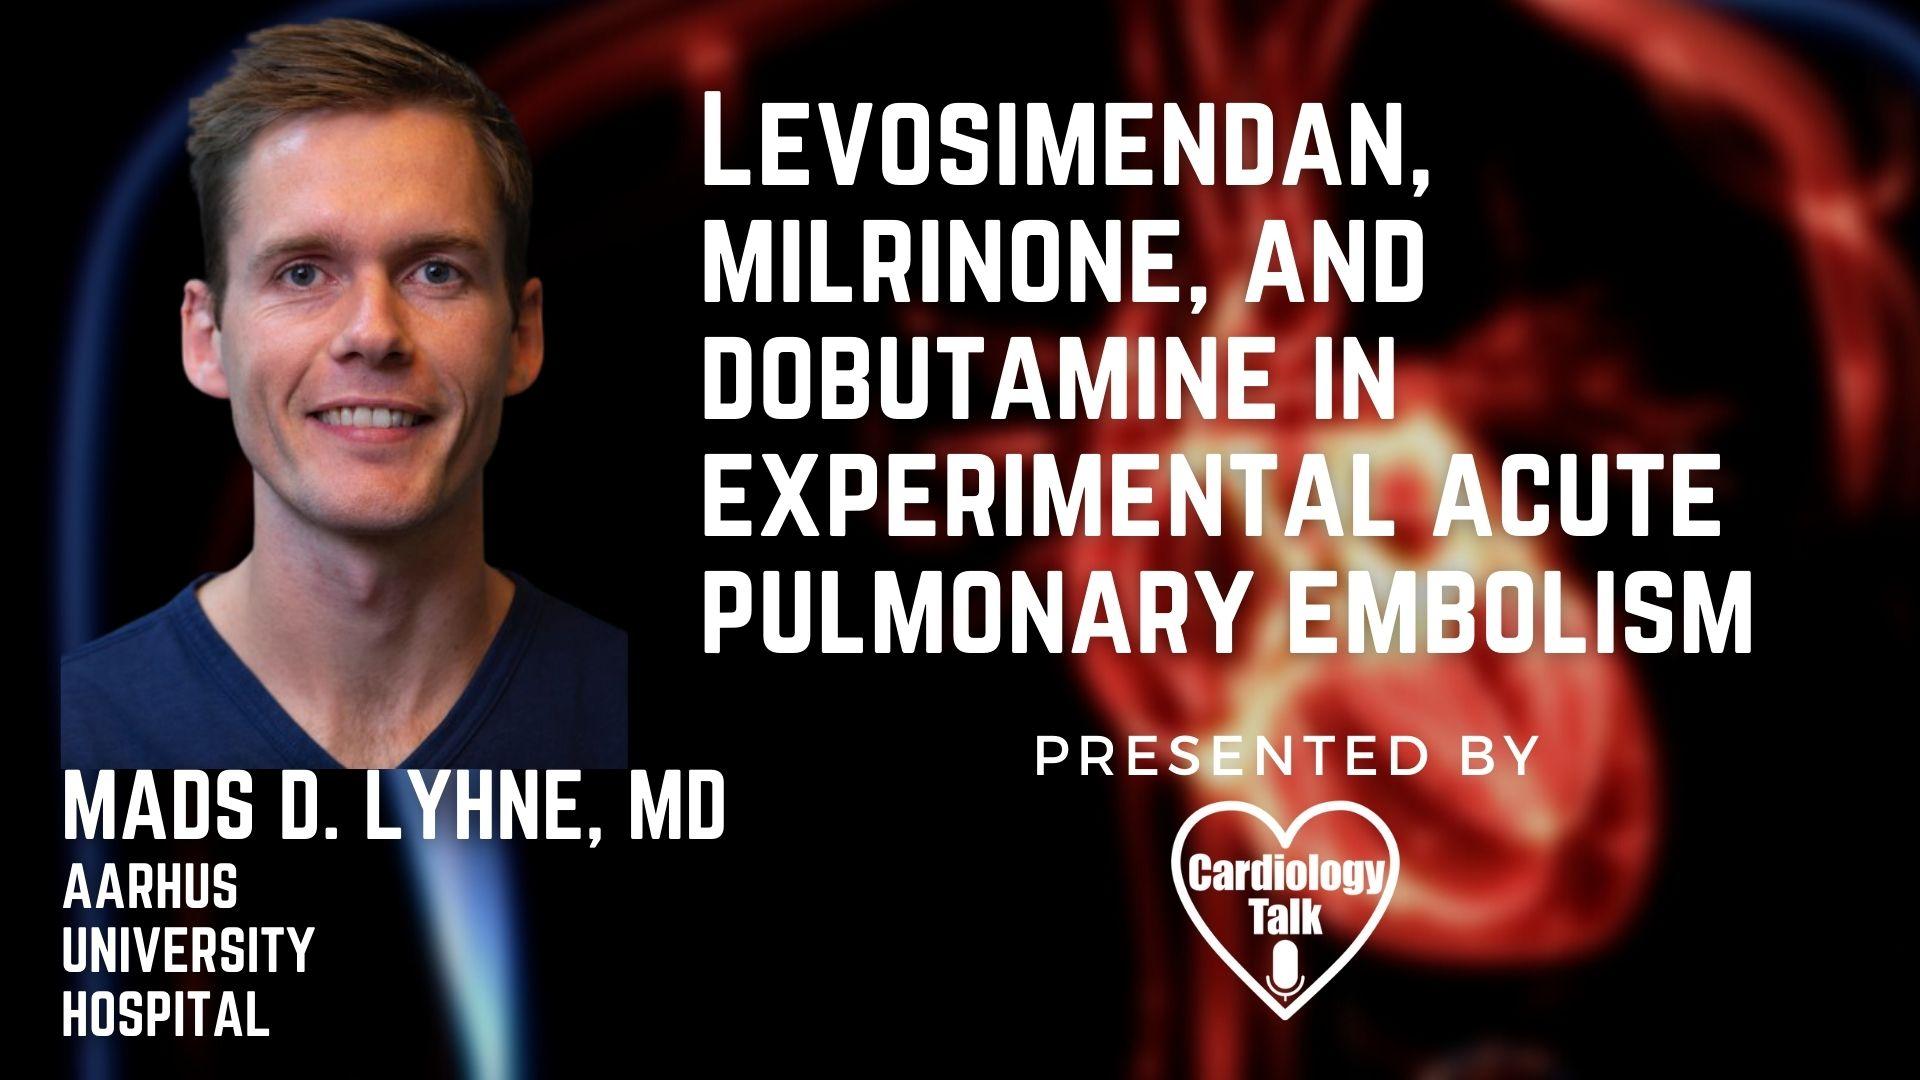 Mads D. Lyhne, MD @MadsDam_MD @AUHdk #AcutePulmanaryEmbolism #Cardiology #Research Experimental Acute Pulmonary Embolism